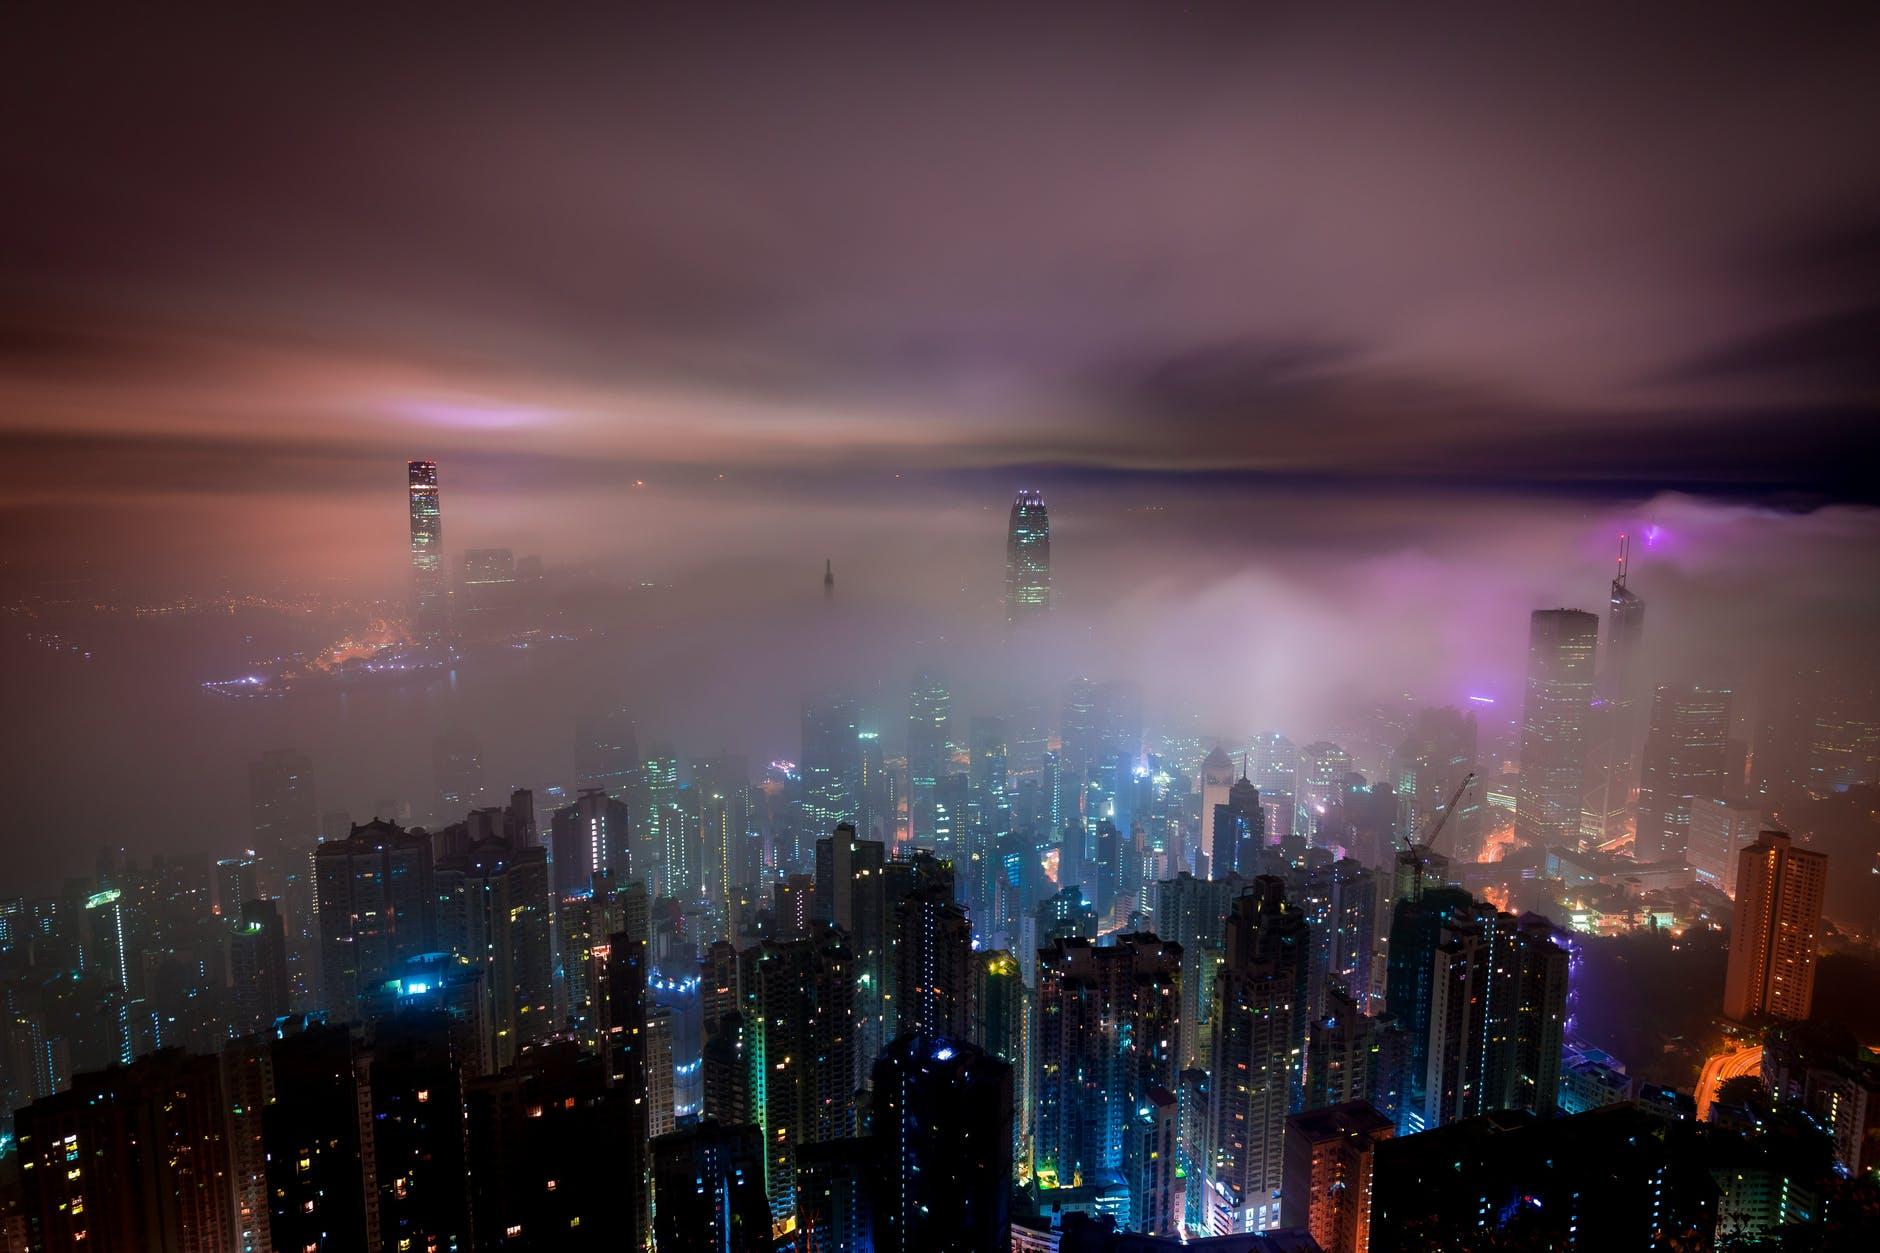 Night City dystopian atmosphere